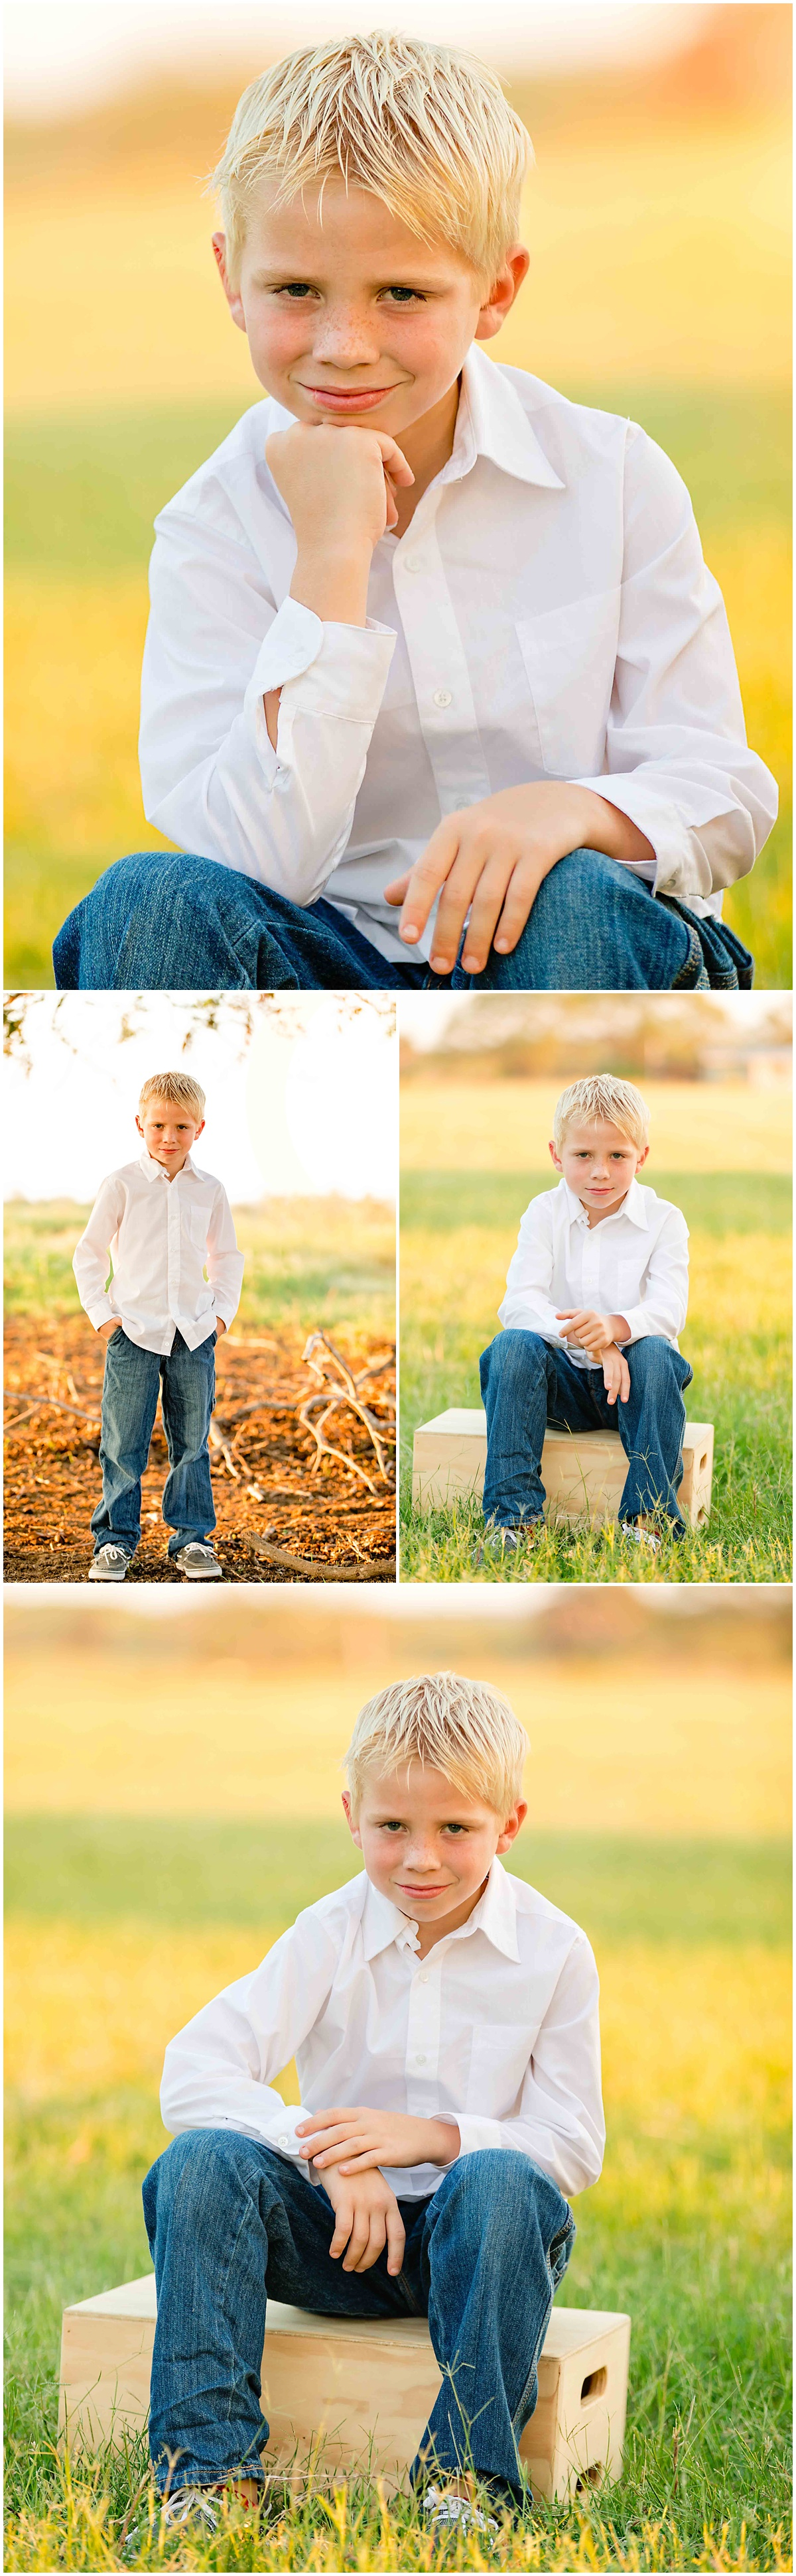 Family-Children-Maternity-Portraits-San-Antonio-Hill-Country-Texas-Carly-Barton-Photography_0026.jpg